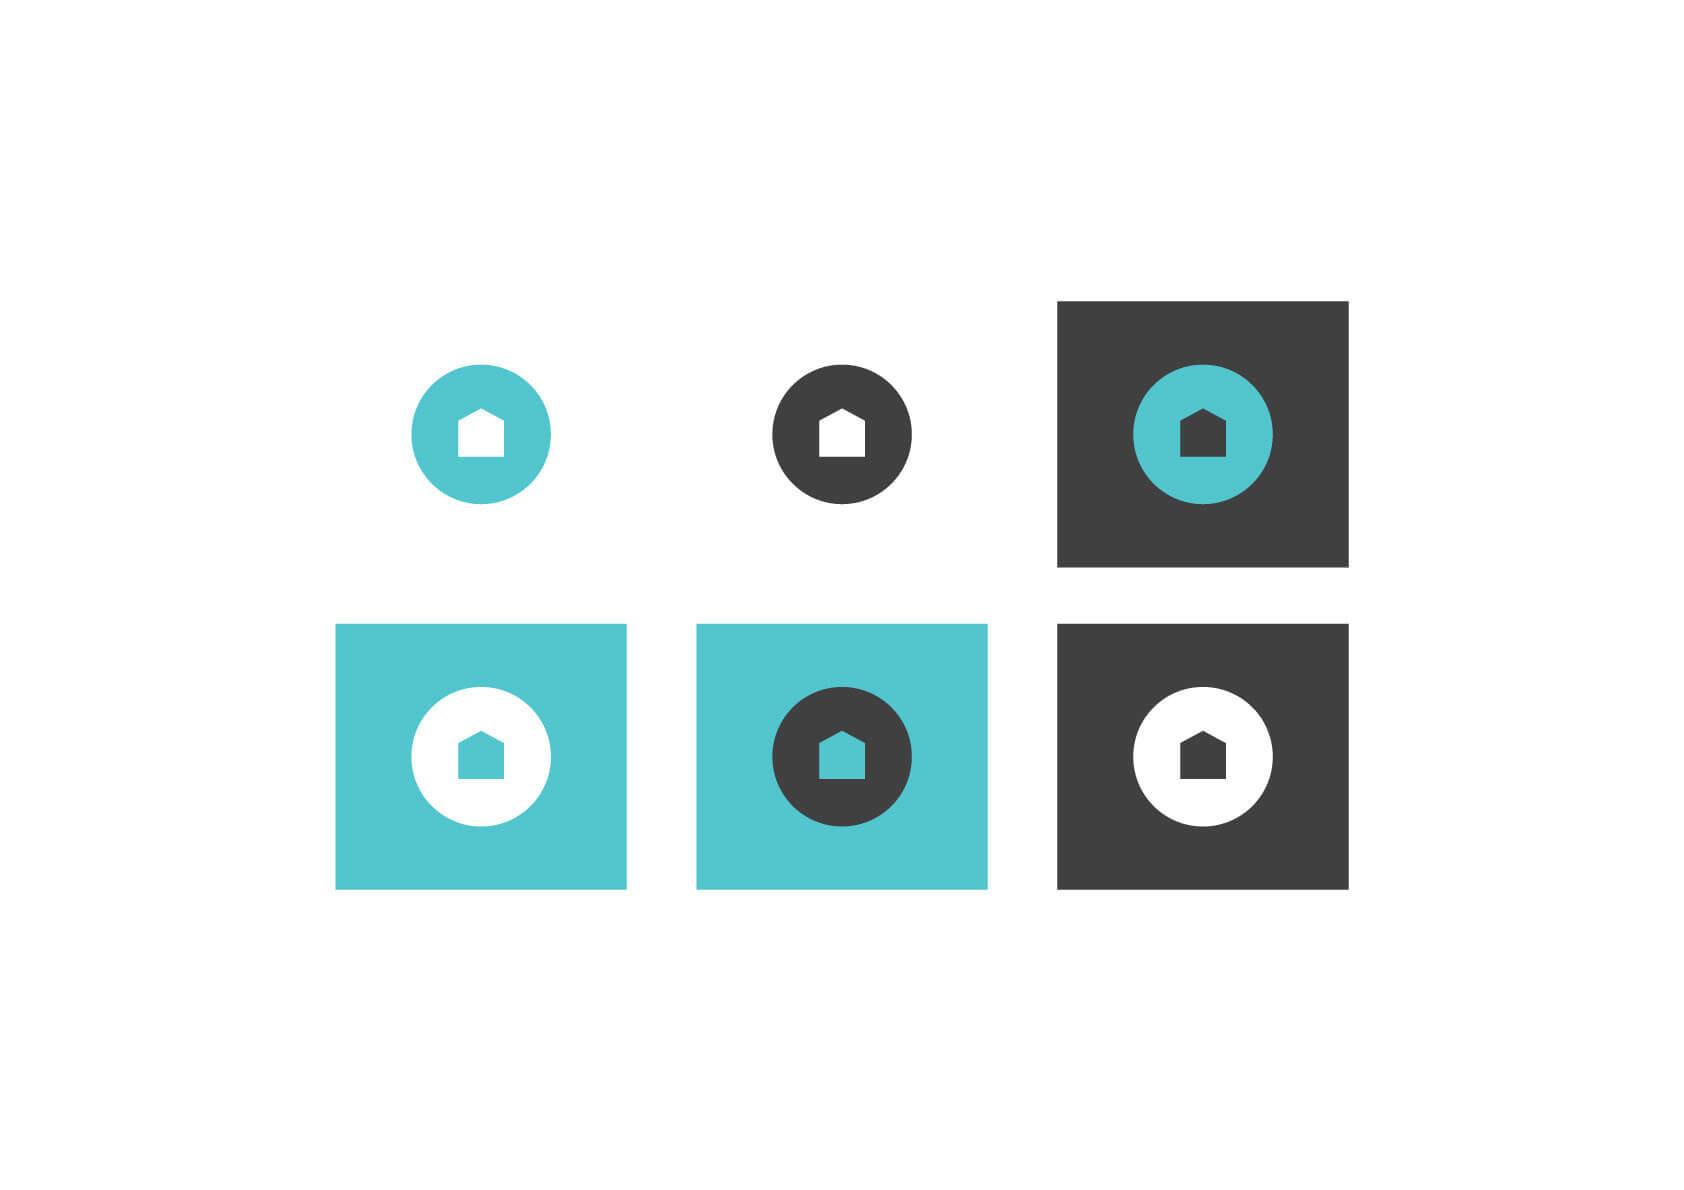 orgodomo-icon-variations